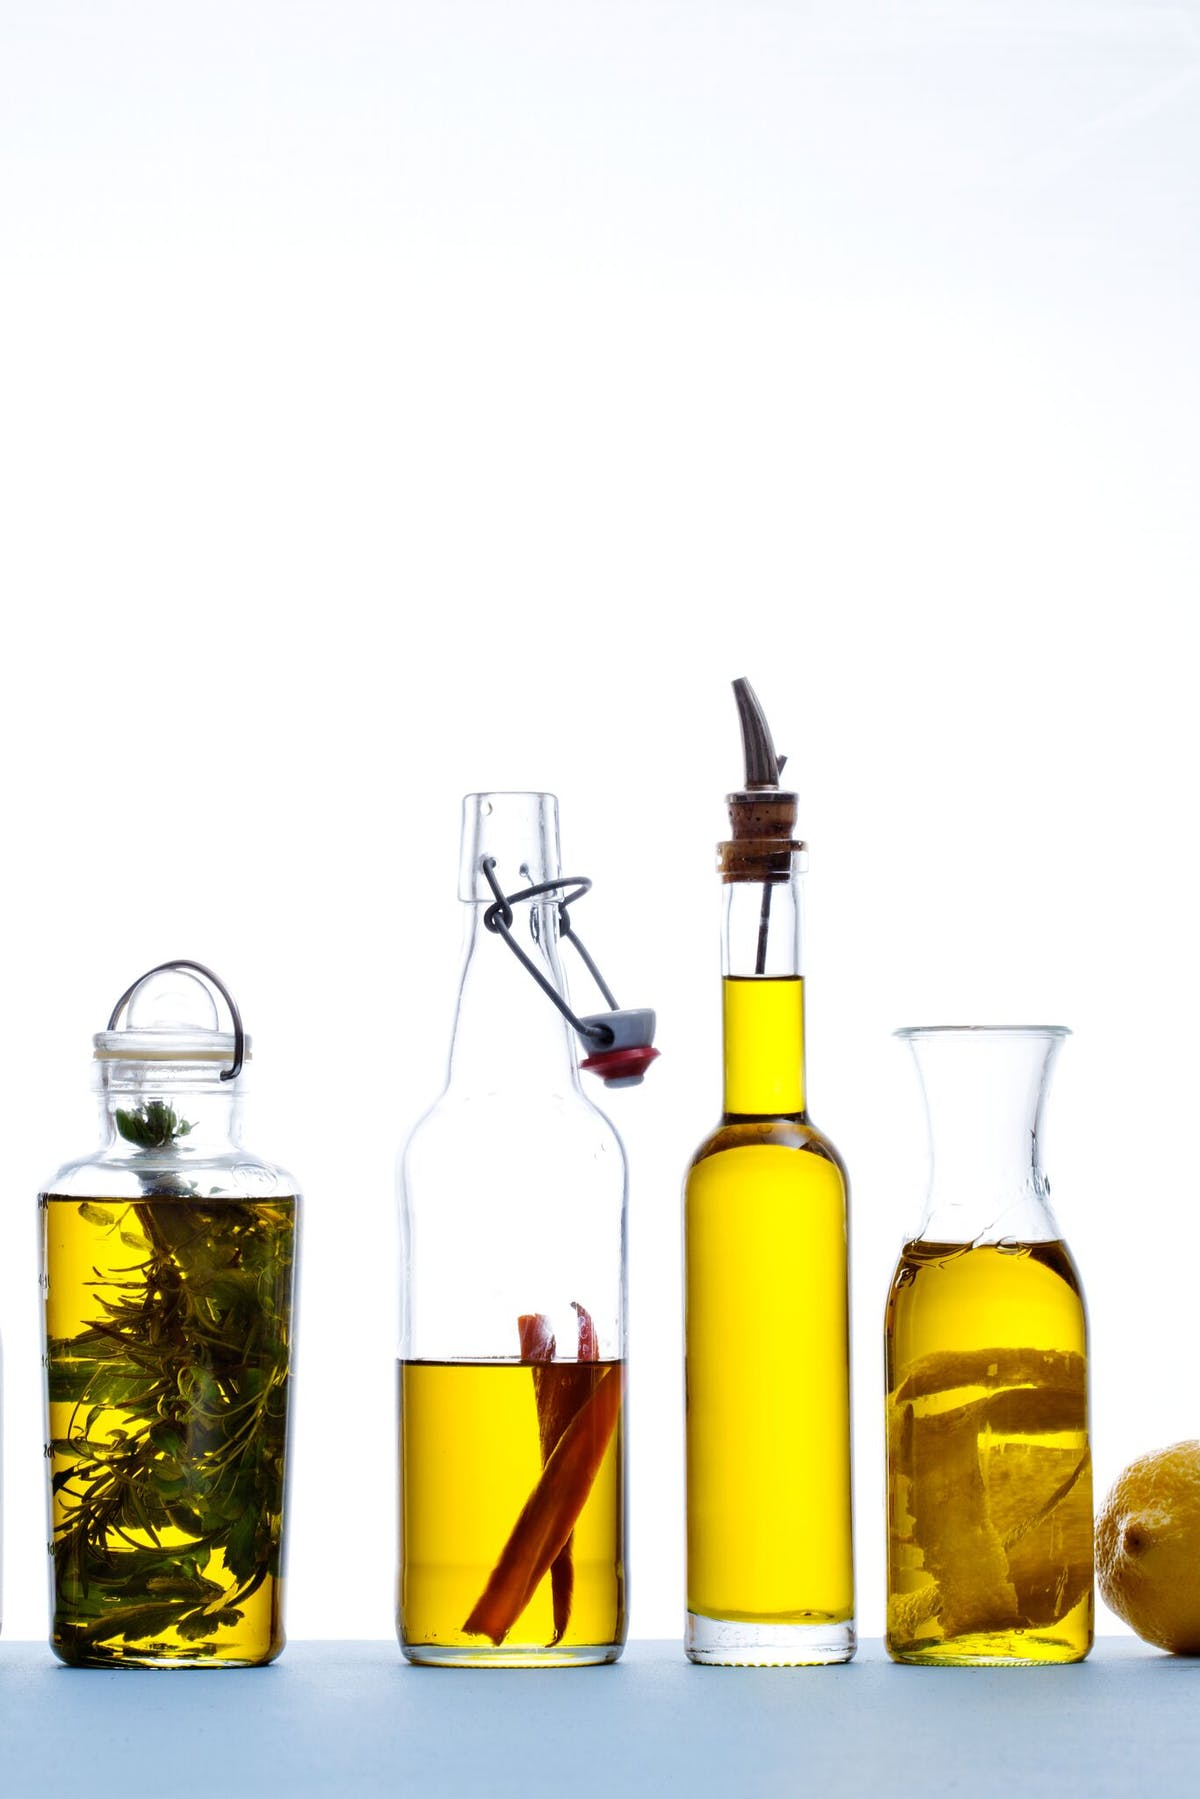 Smaksatt olivolja